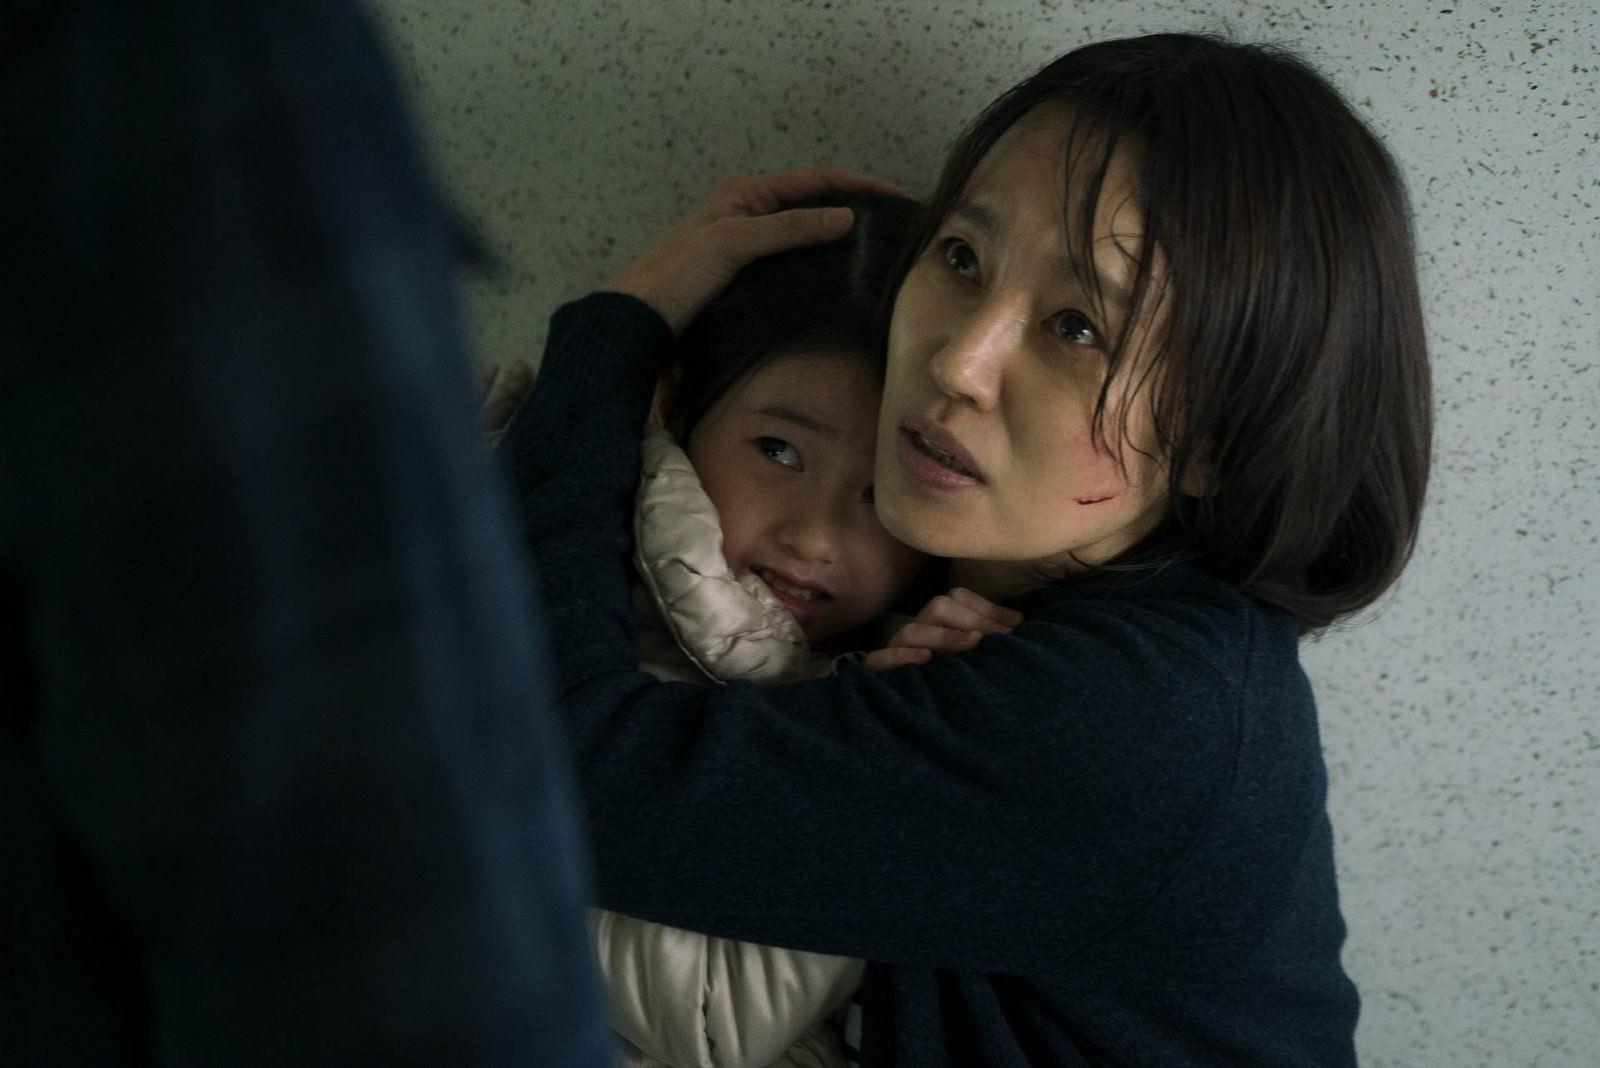 Movie, 목격자(韓國, 2018) / 致命目擊(台) / The Witness(英文) / 目击者(網), 電影劇照